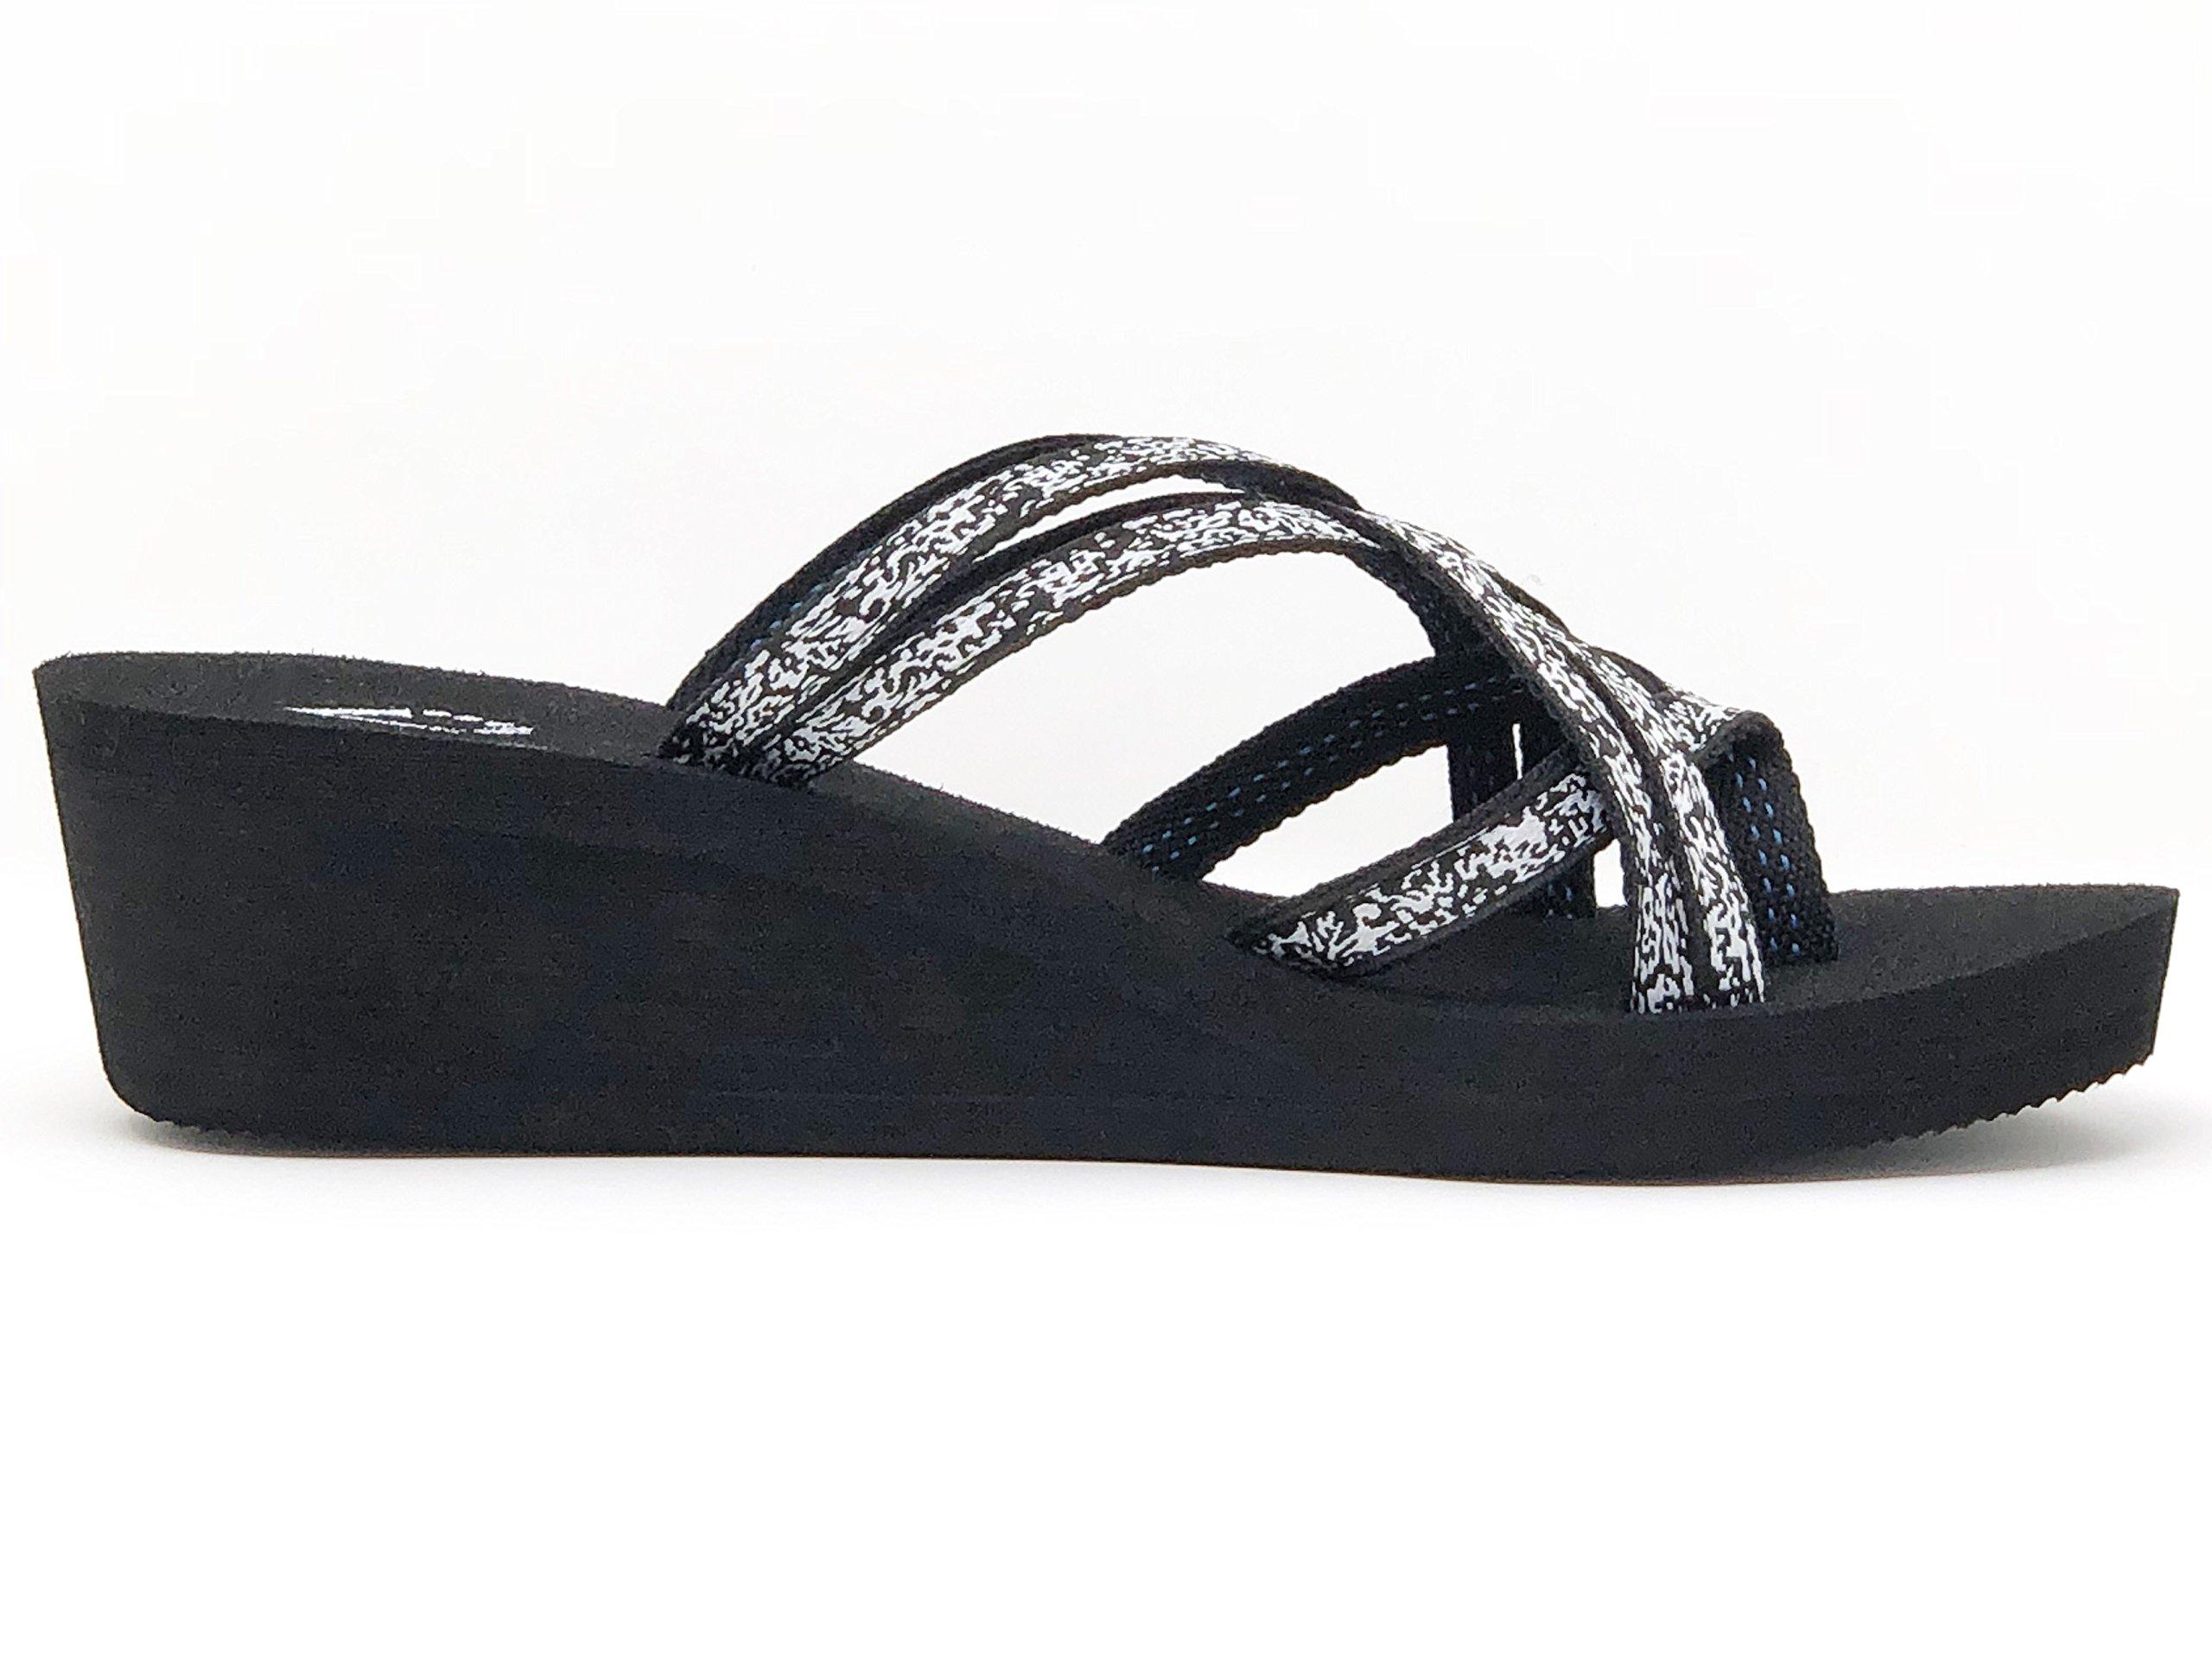 Viakix Wedge Flip Flops for Women – Comfortable, Stylish, Cute, Women's Strappy Sandal for Walking, Beach, Travel by Viakix (Image #3)